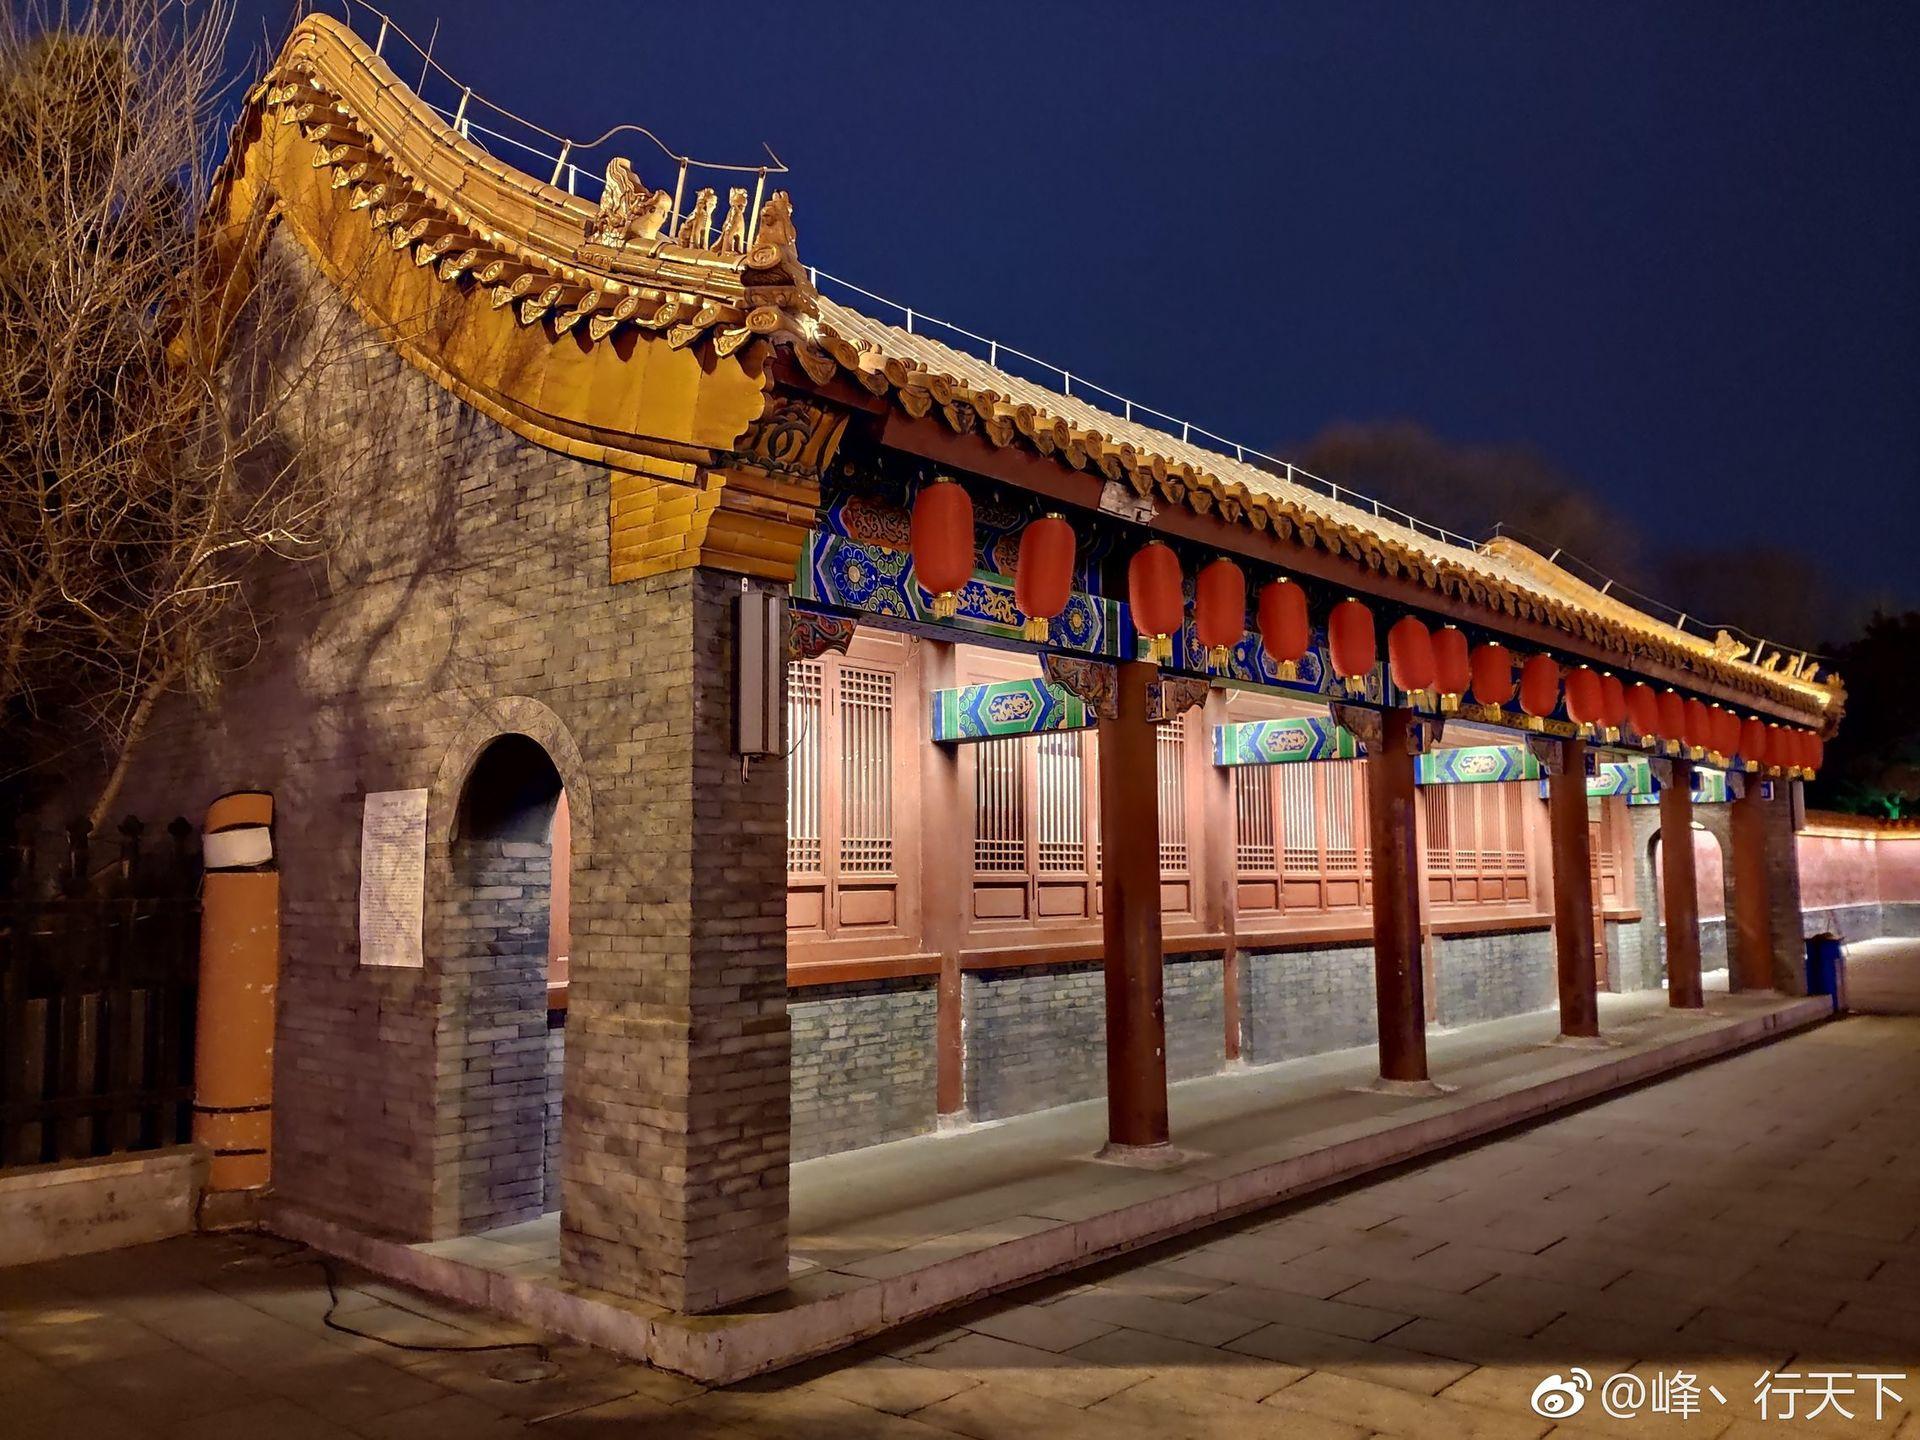 Noční režim Xiaomi Mi MIX 3